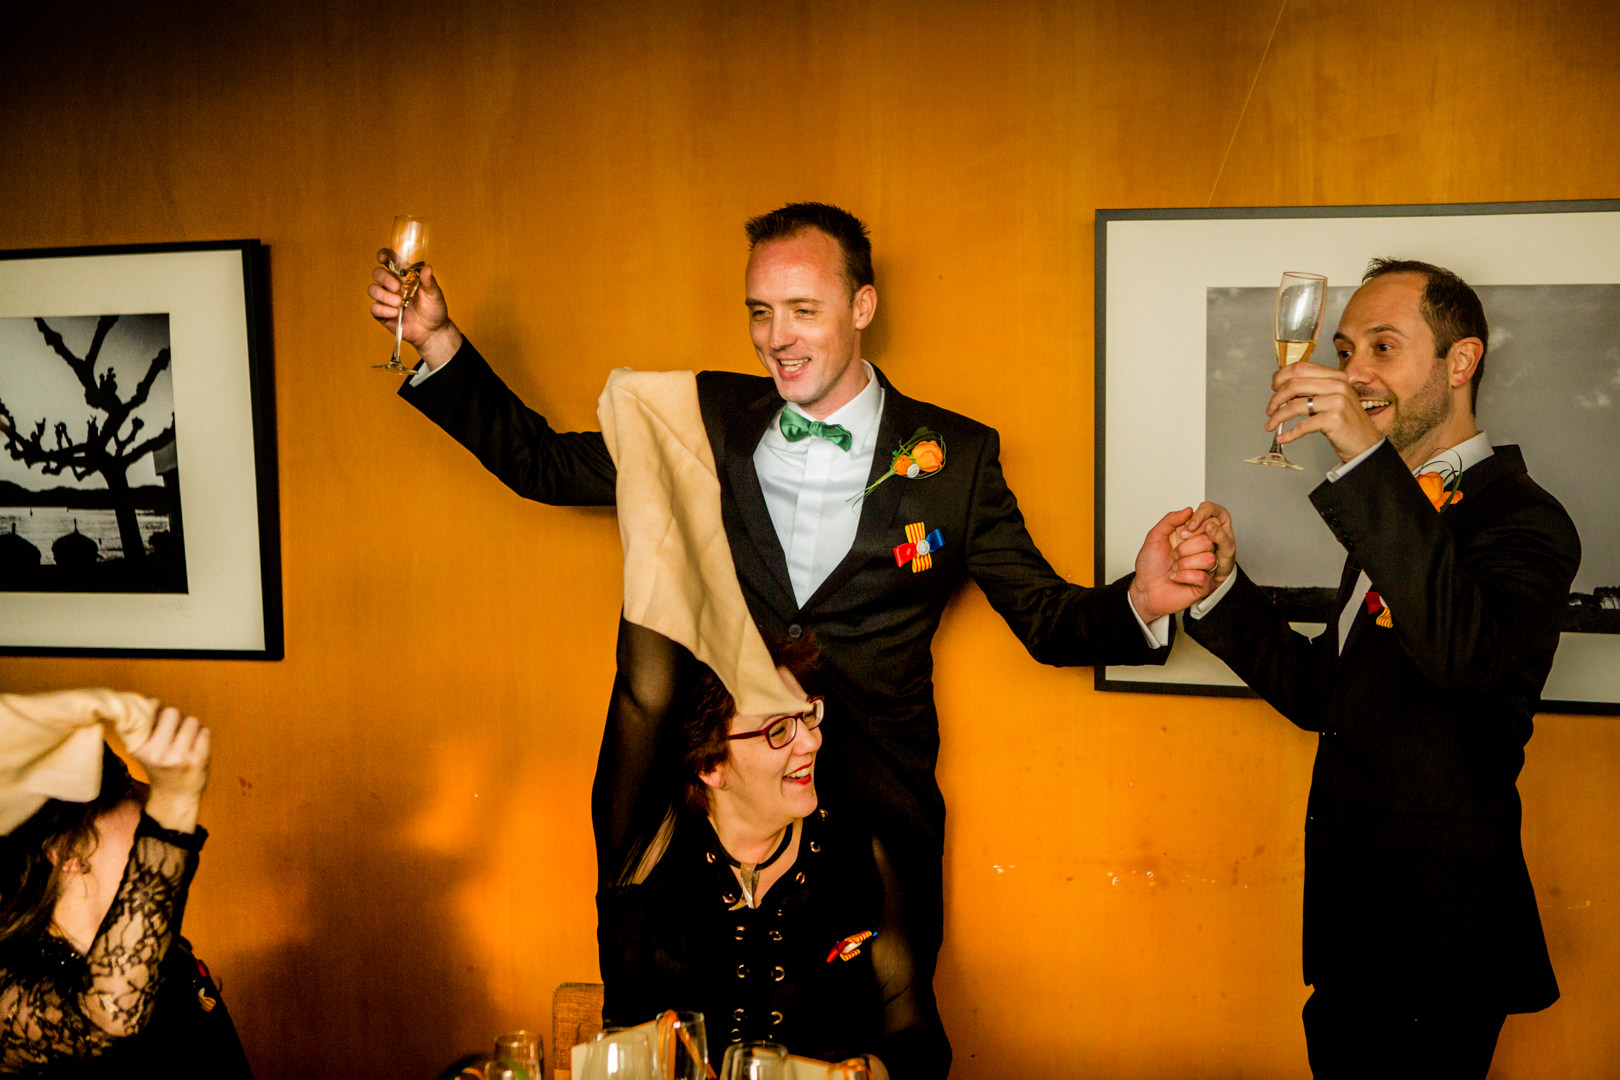 Same-sex-wedding-barcelona-boda- gay-samesex-engagement-Rafael-Torres-fotografo-bodas-sevilla-madrid-barcelona-wedding-photographer--48.jpg